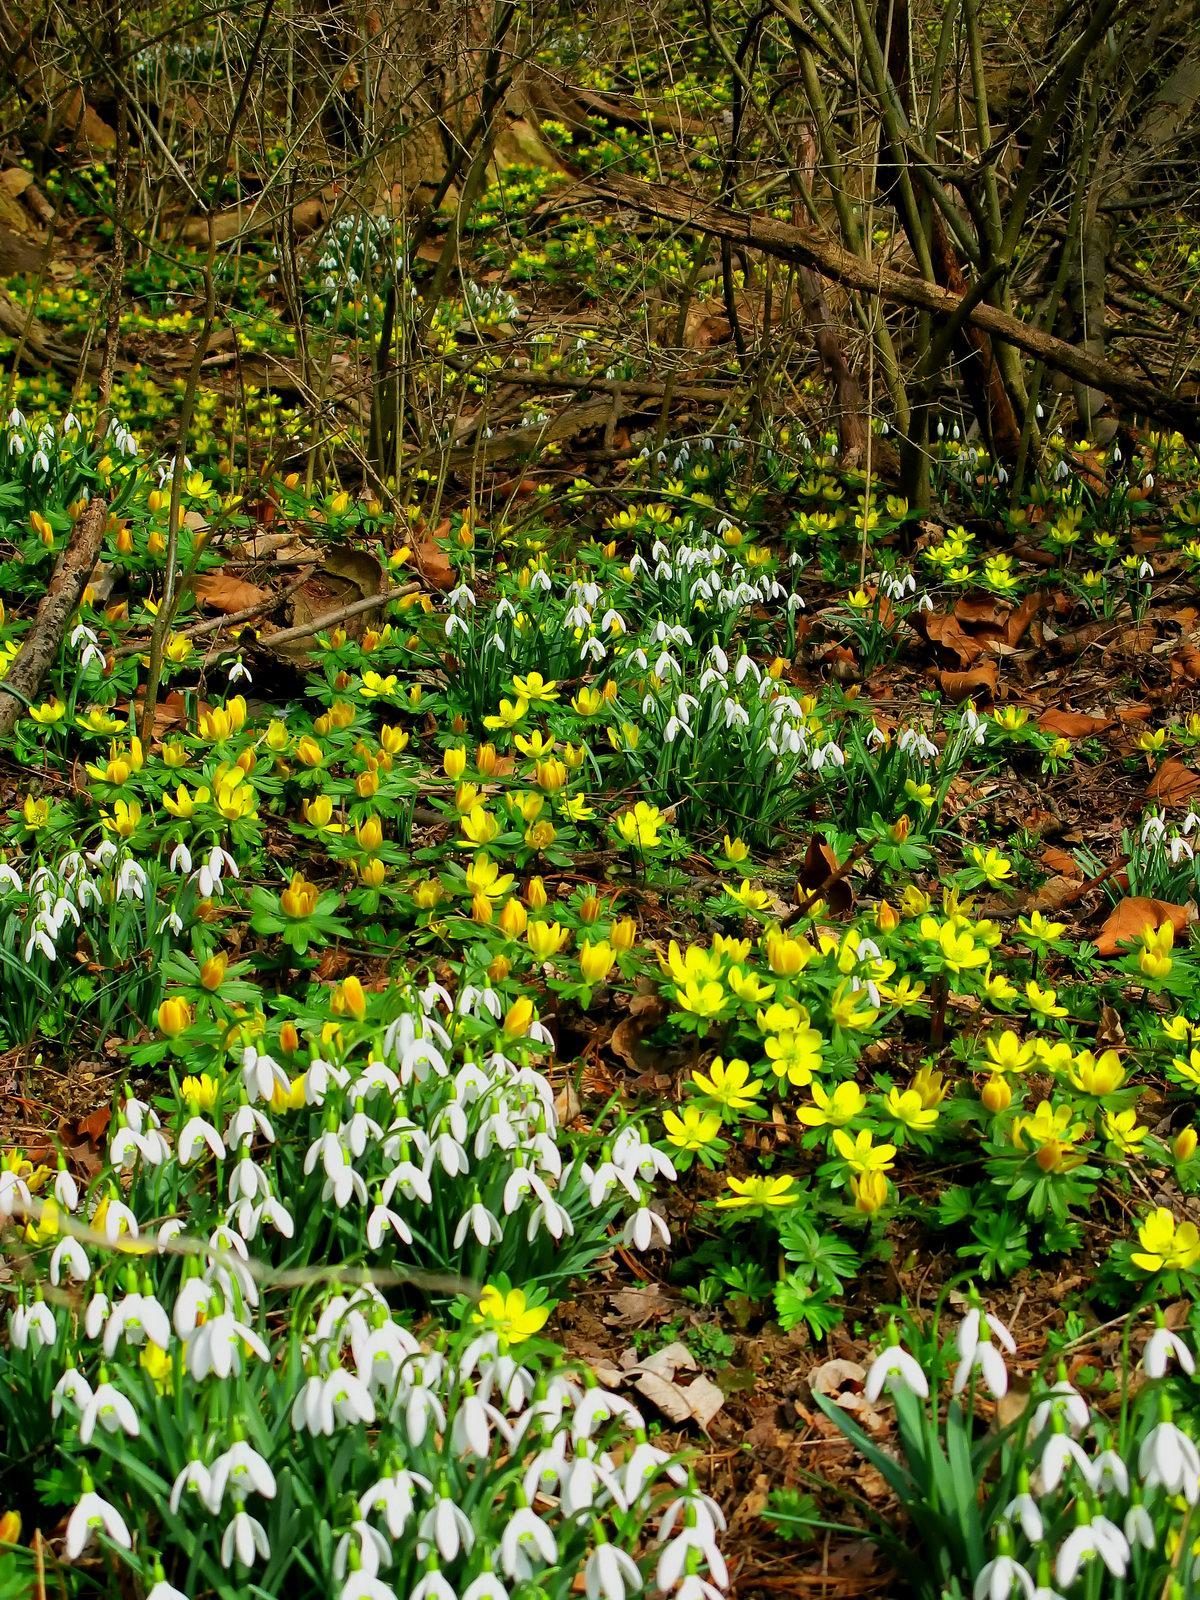 pennsylvania, allentown, snowdrops, winter aconite, spring,, photo